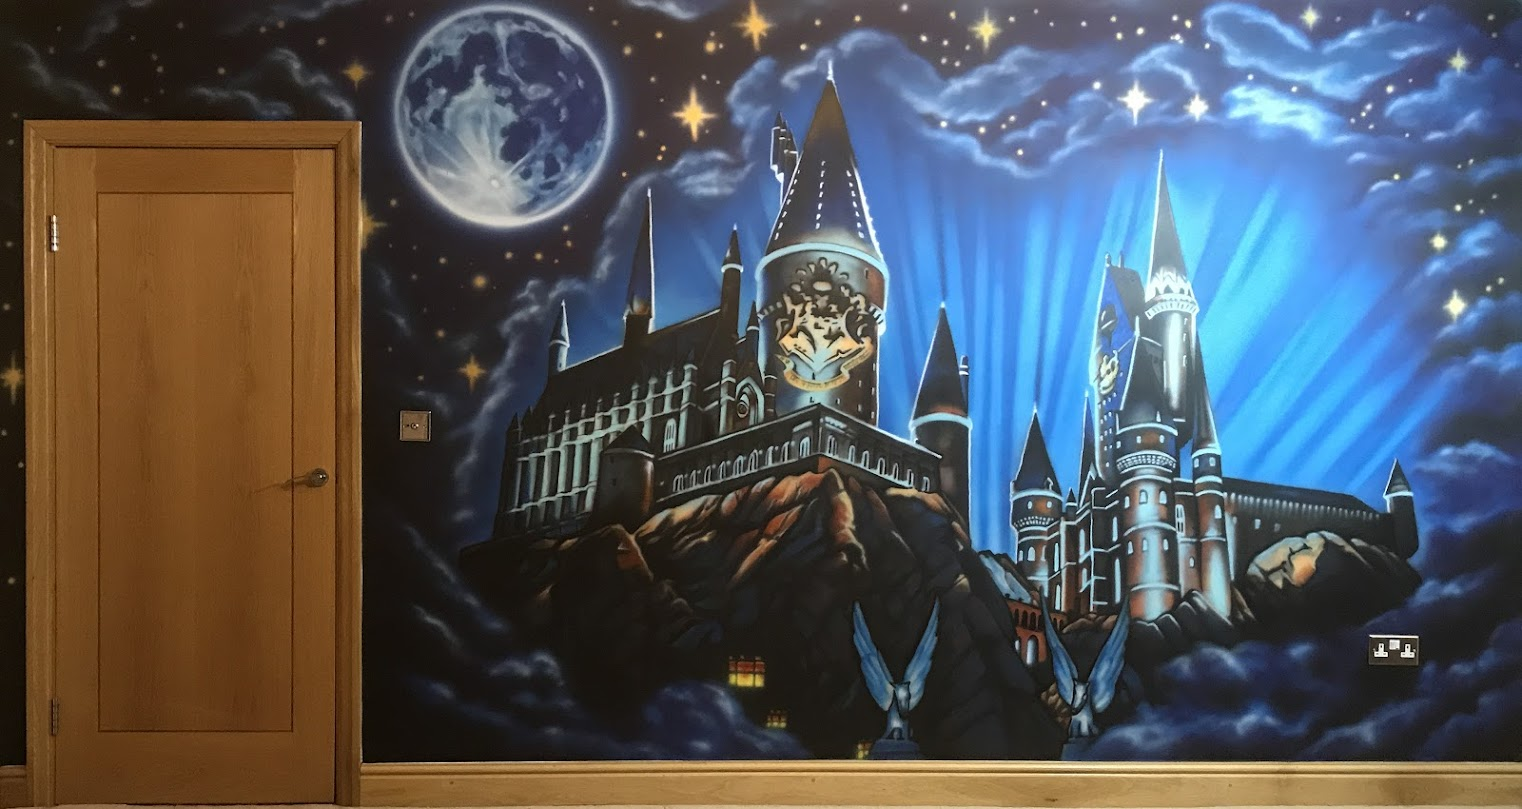 Hogwarts Mural by Adam Pekr Painter on Zealous